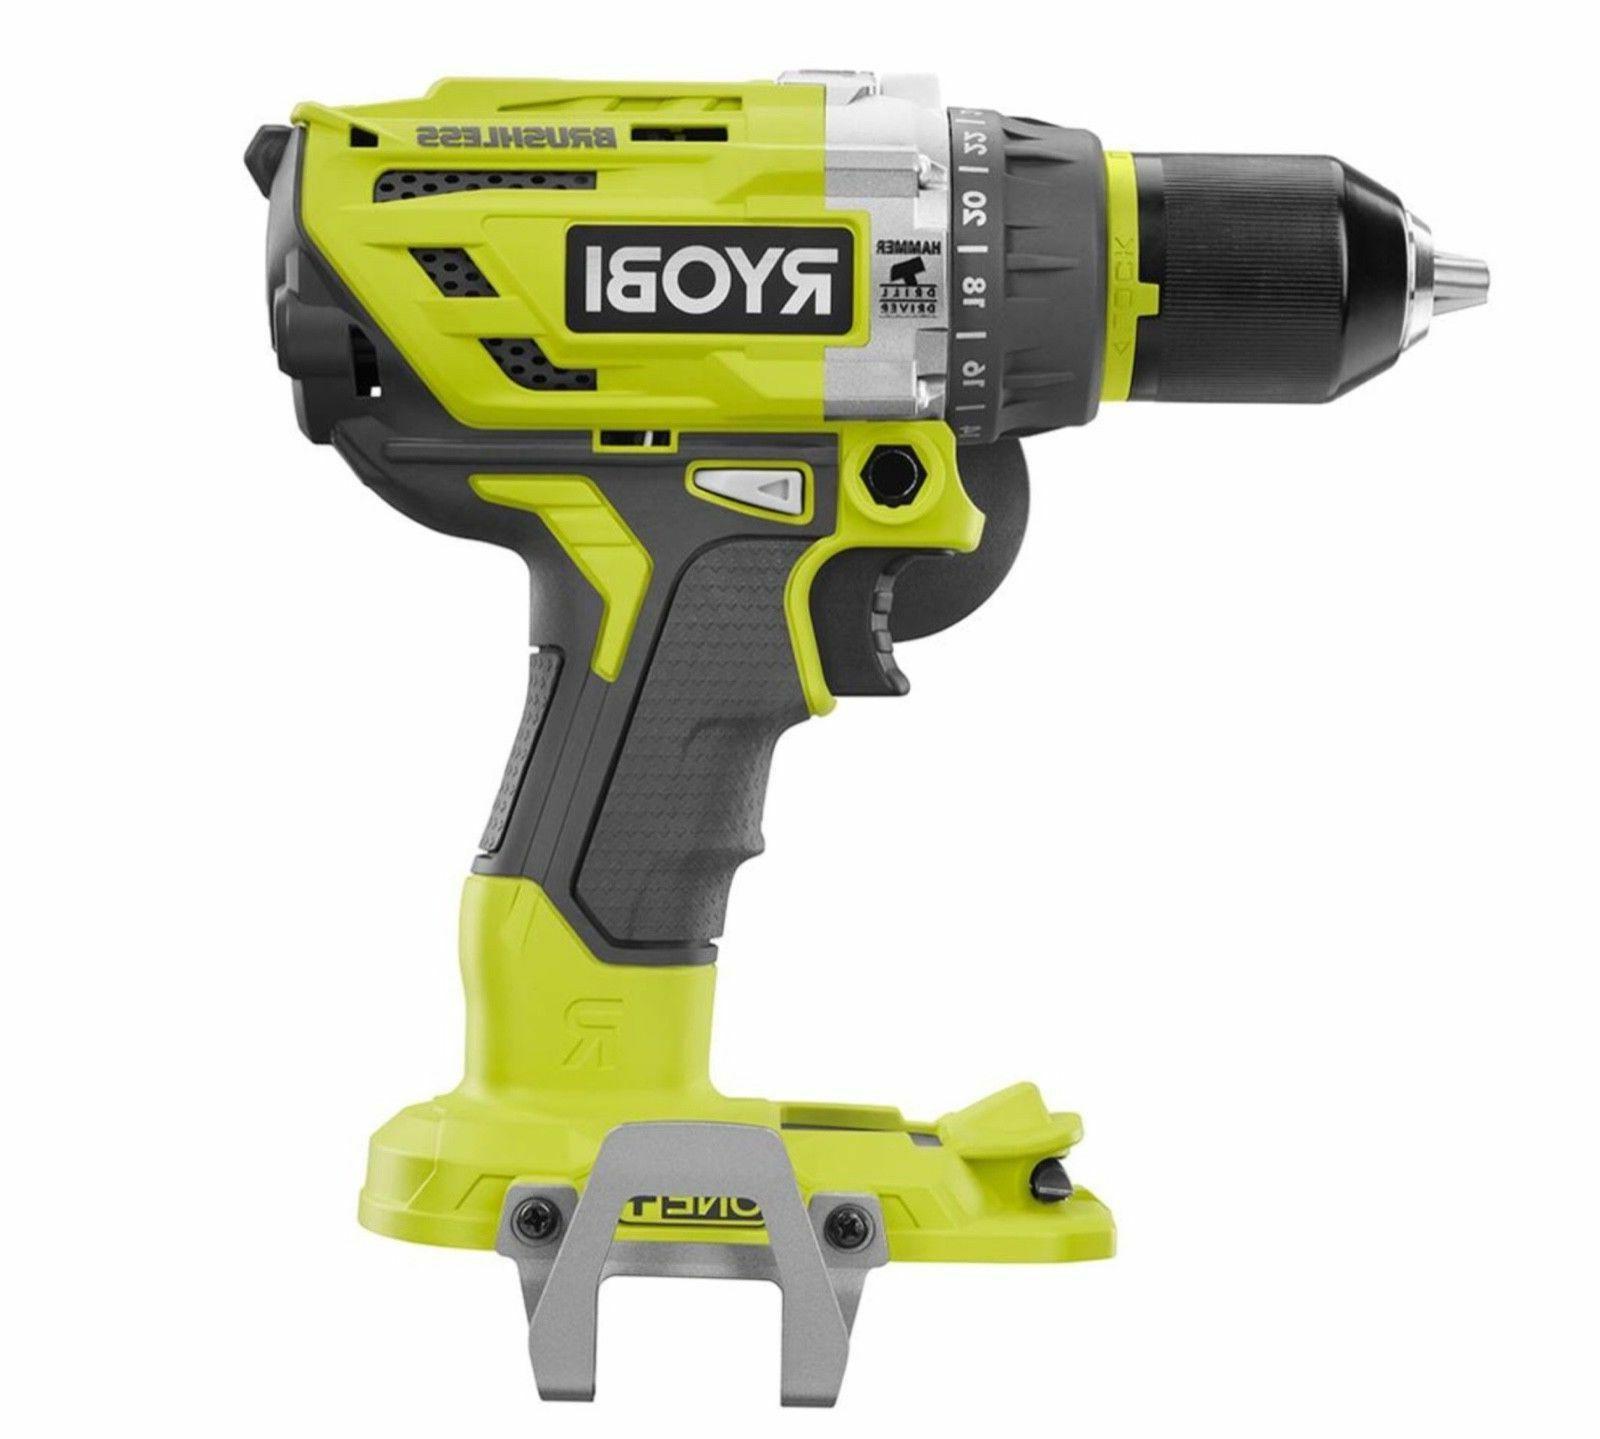 "New Ryobi P251 One + 18V 1/2"" 2 Speed Hammer Drill Driver"